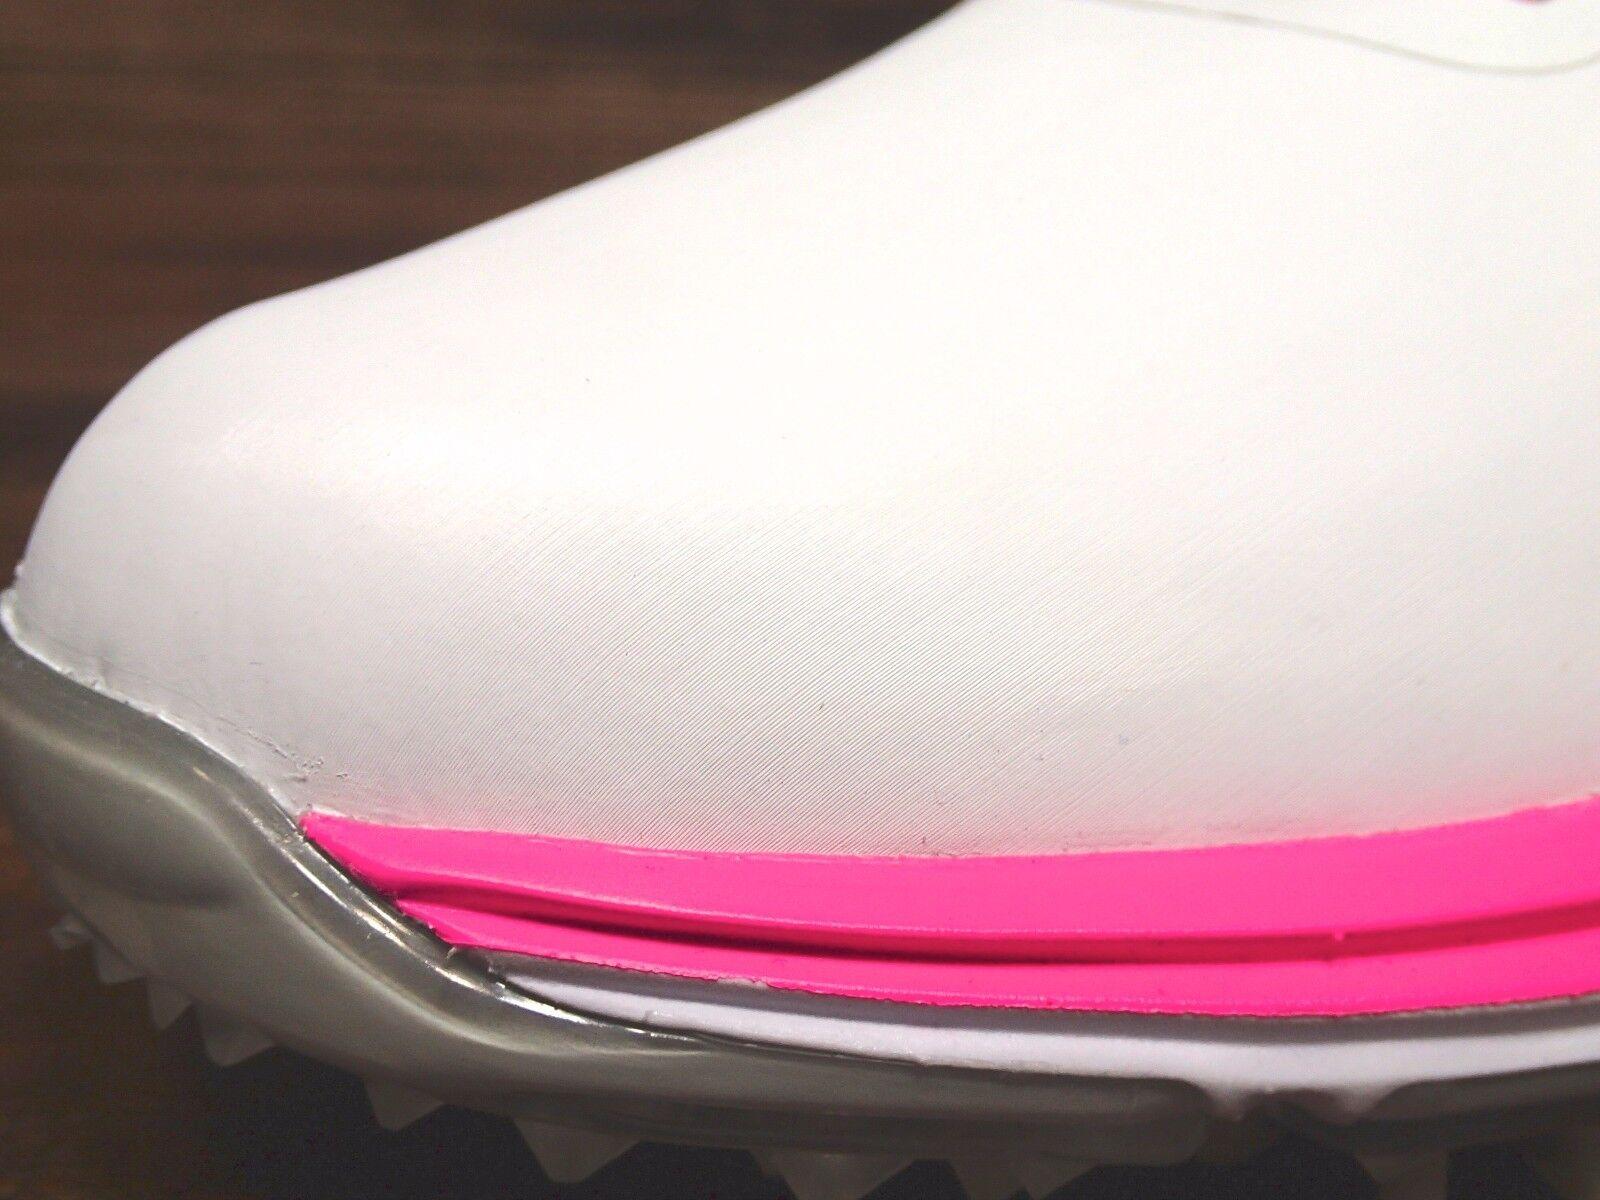 nike kontrolle - id frauen lunar kontrolle nike 3 weißen rosa custom golf stollen 779823 991 sz 8,5 1c9981